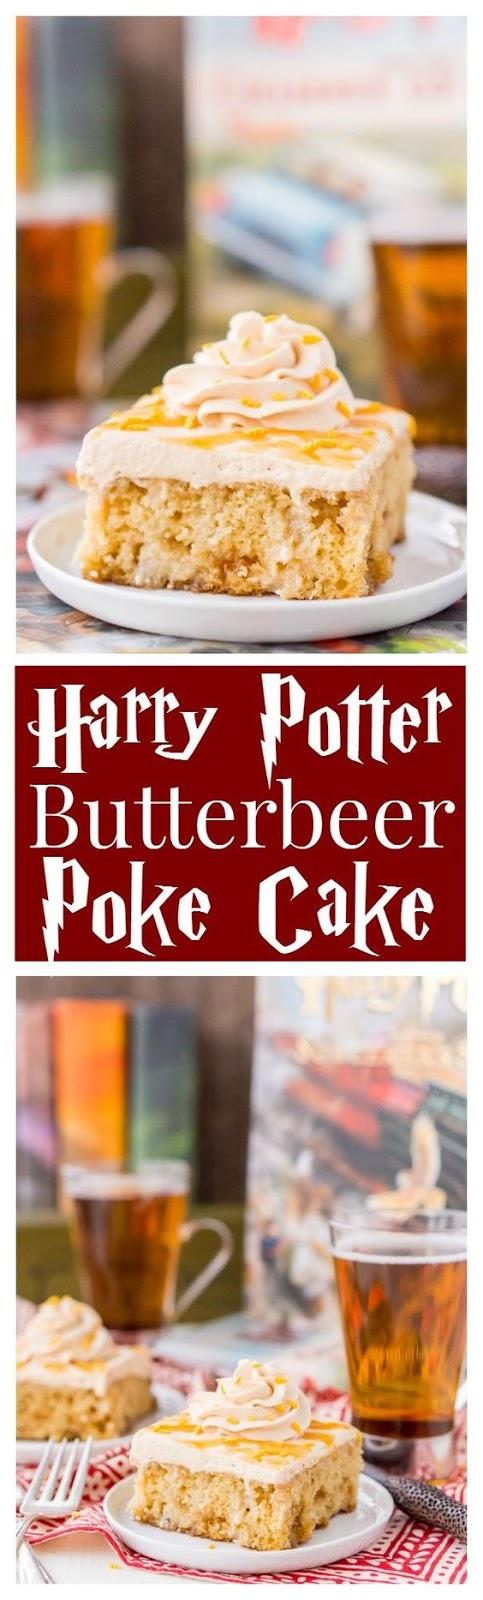 Harry Potter Butterbeer Poke Cake